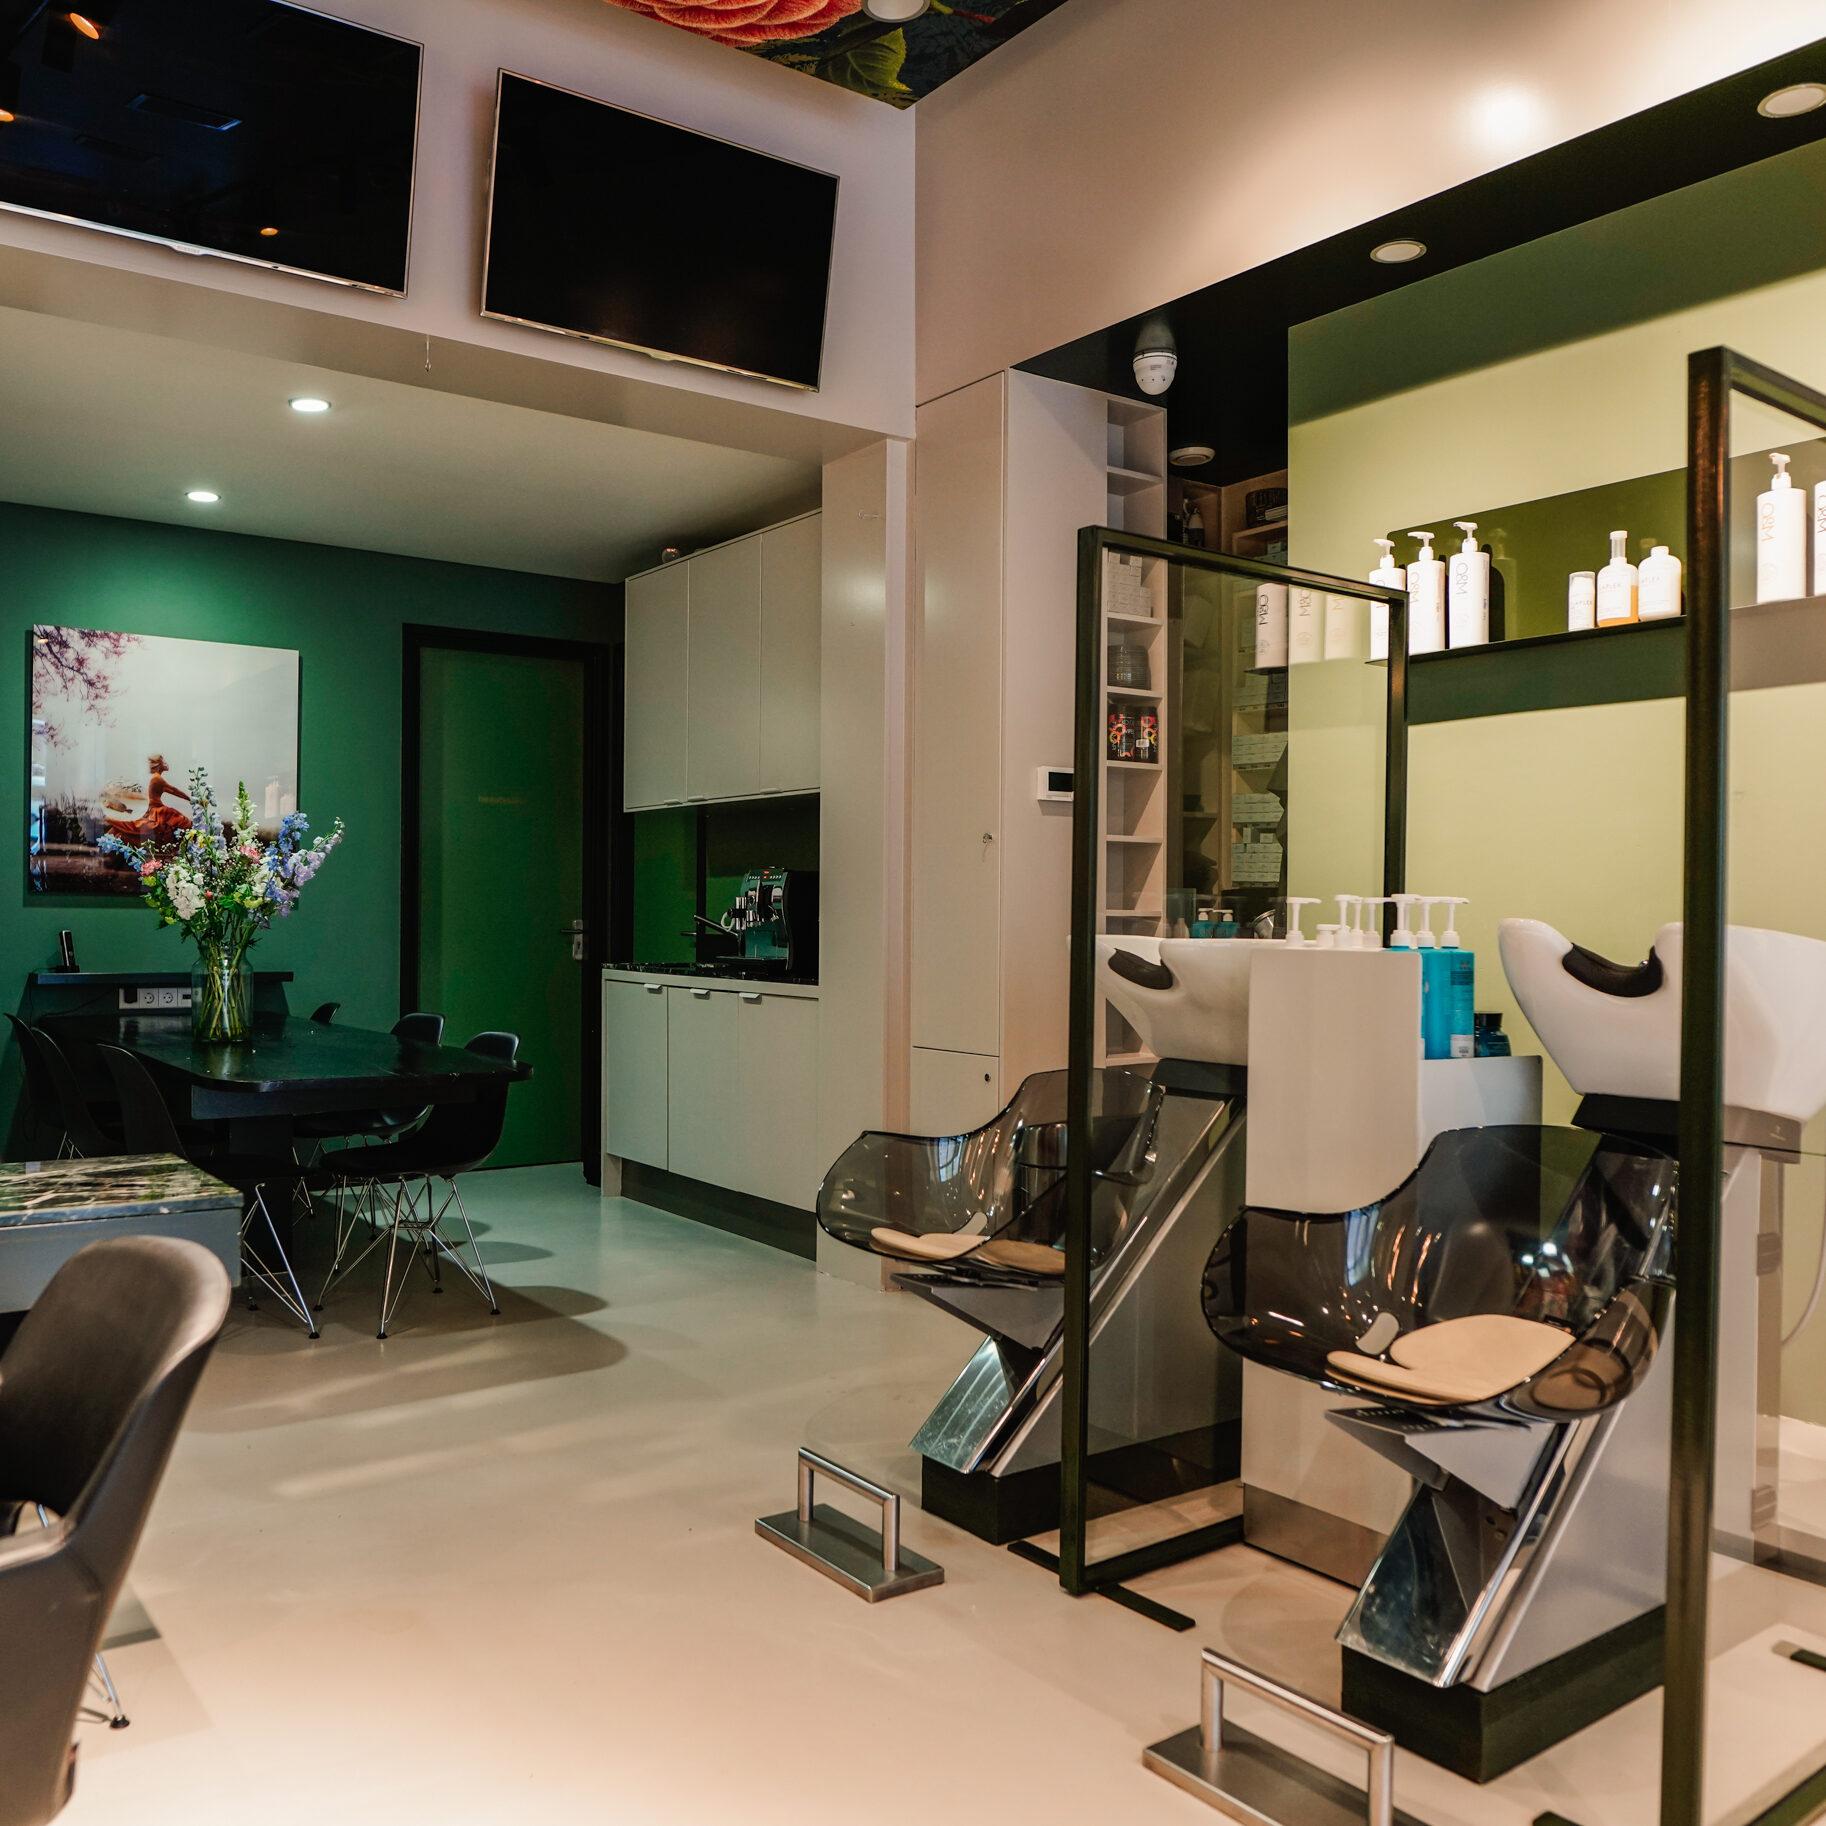 Salon De Pijp afbeelding 2